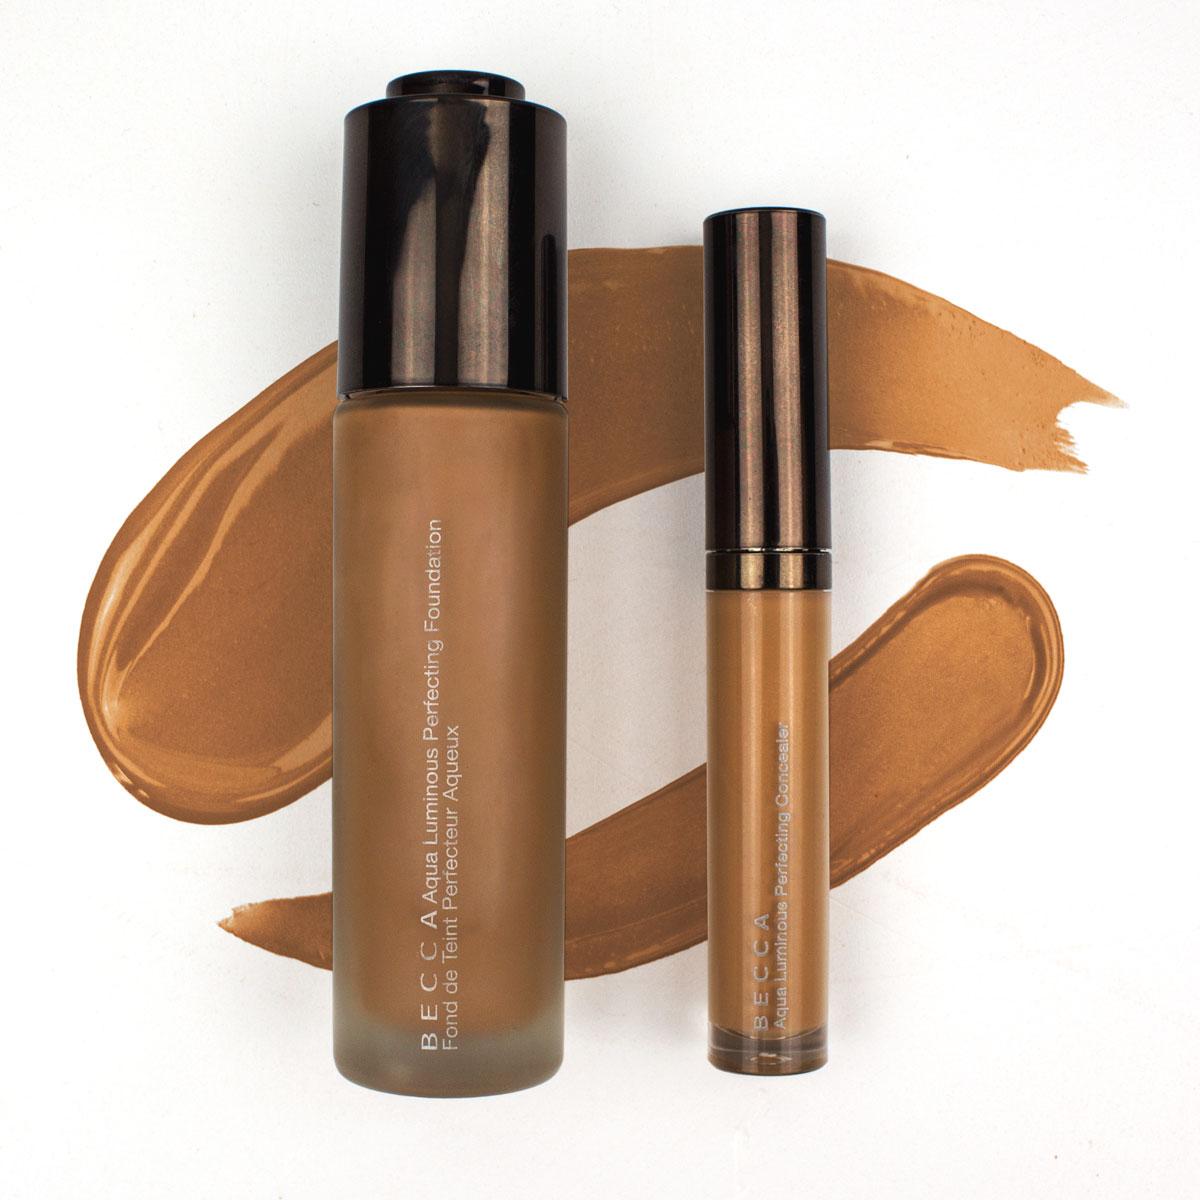 Luxury Brand Partners Announces Sale of Becca Cosmetics to The Estée Lauder Companies Inc.